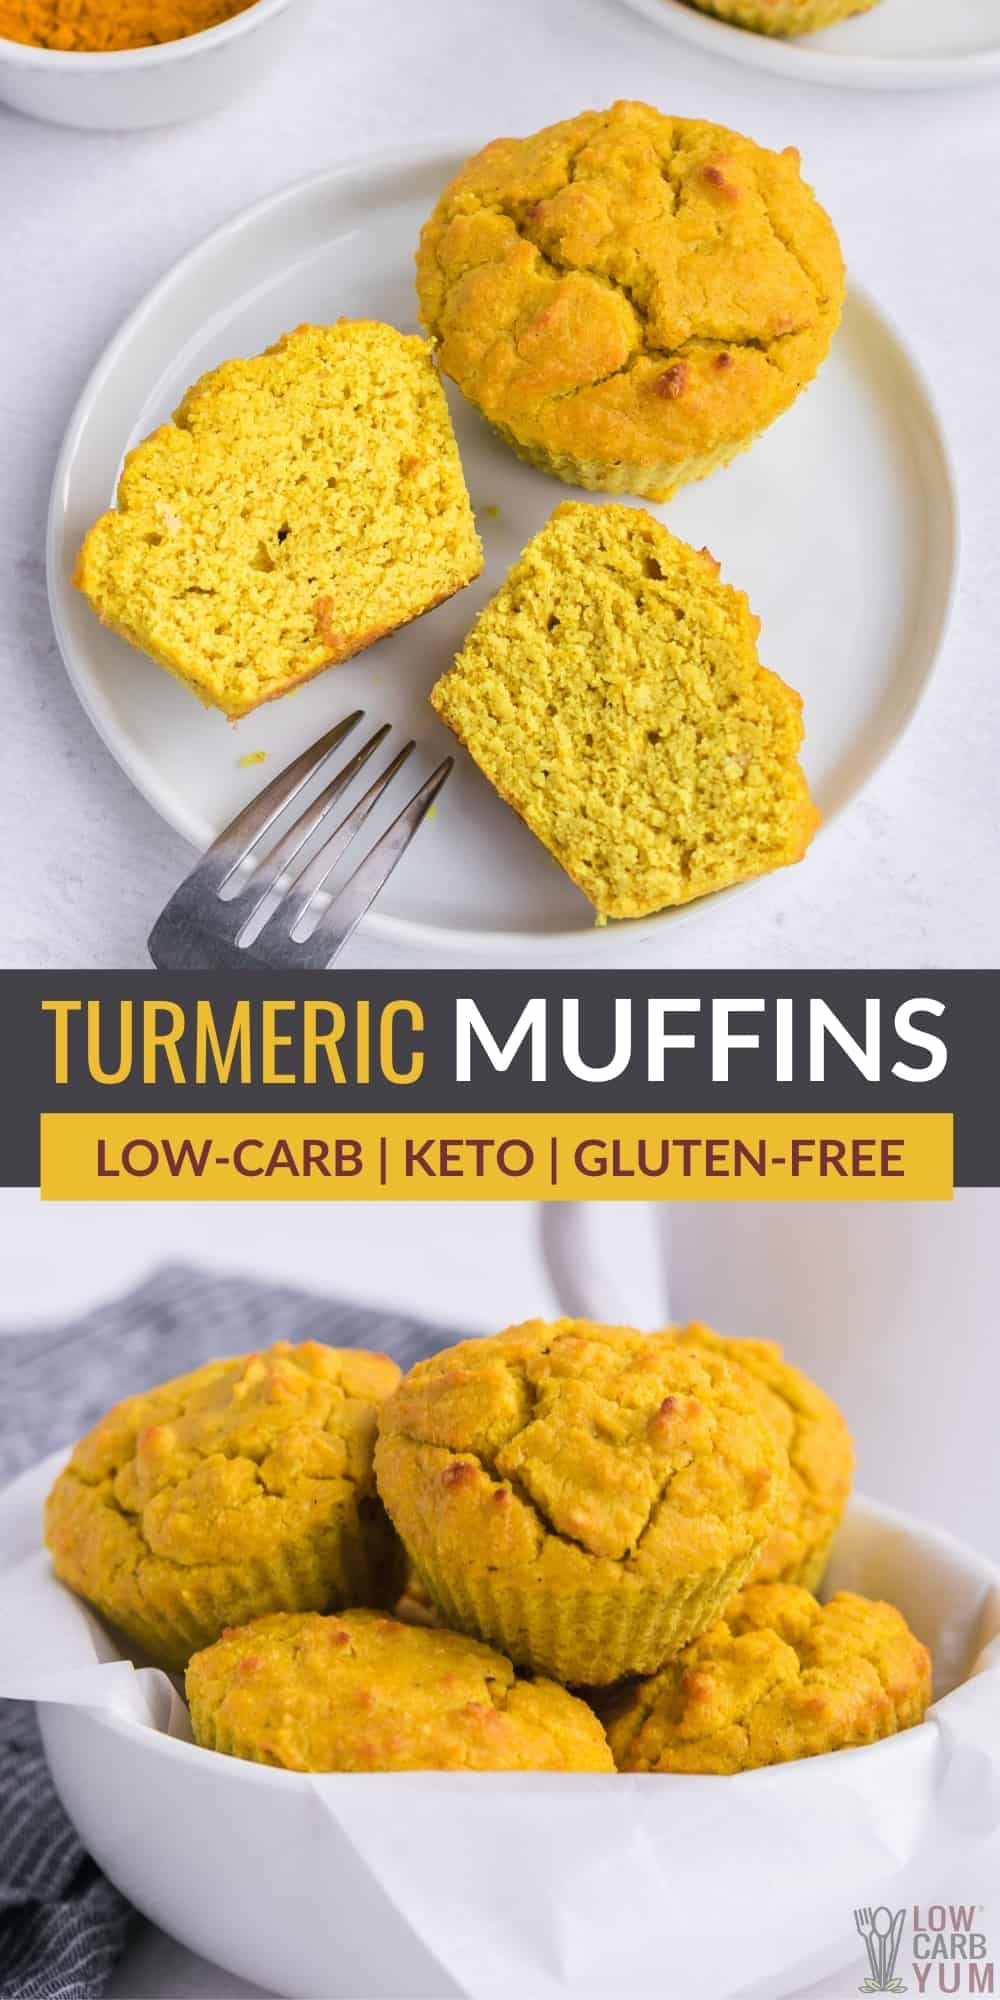 turmeric muffins pintrest image